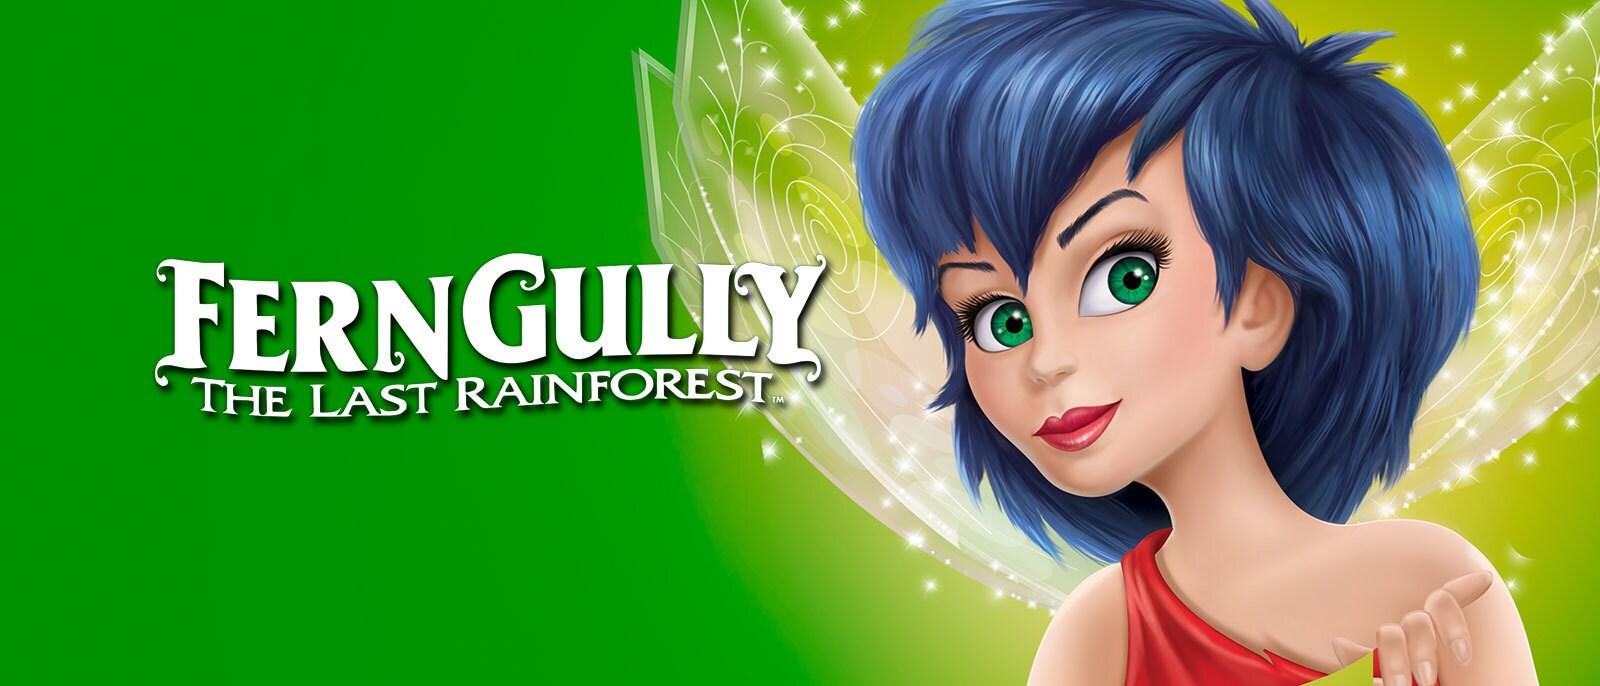 Ferngully: The Last Rainforest Hero